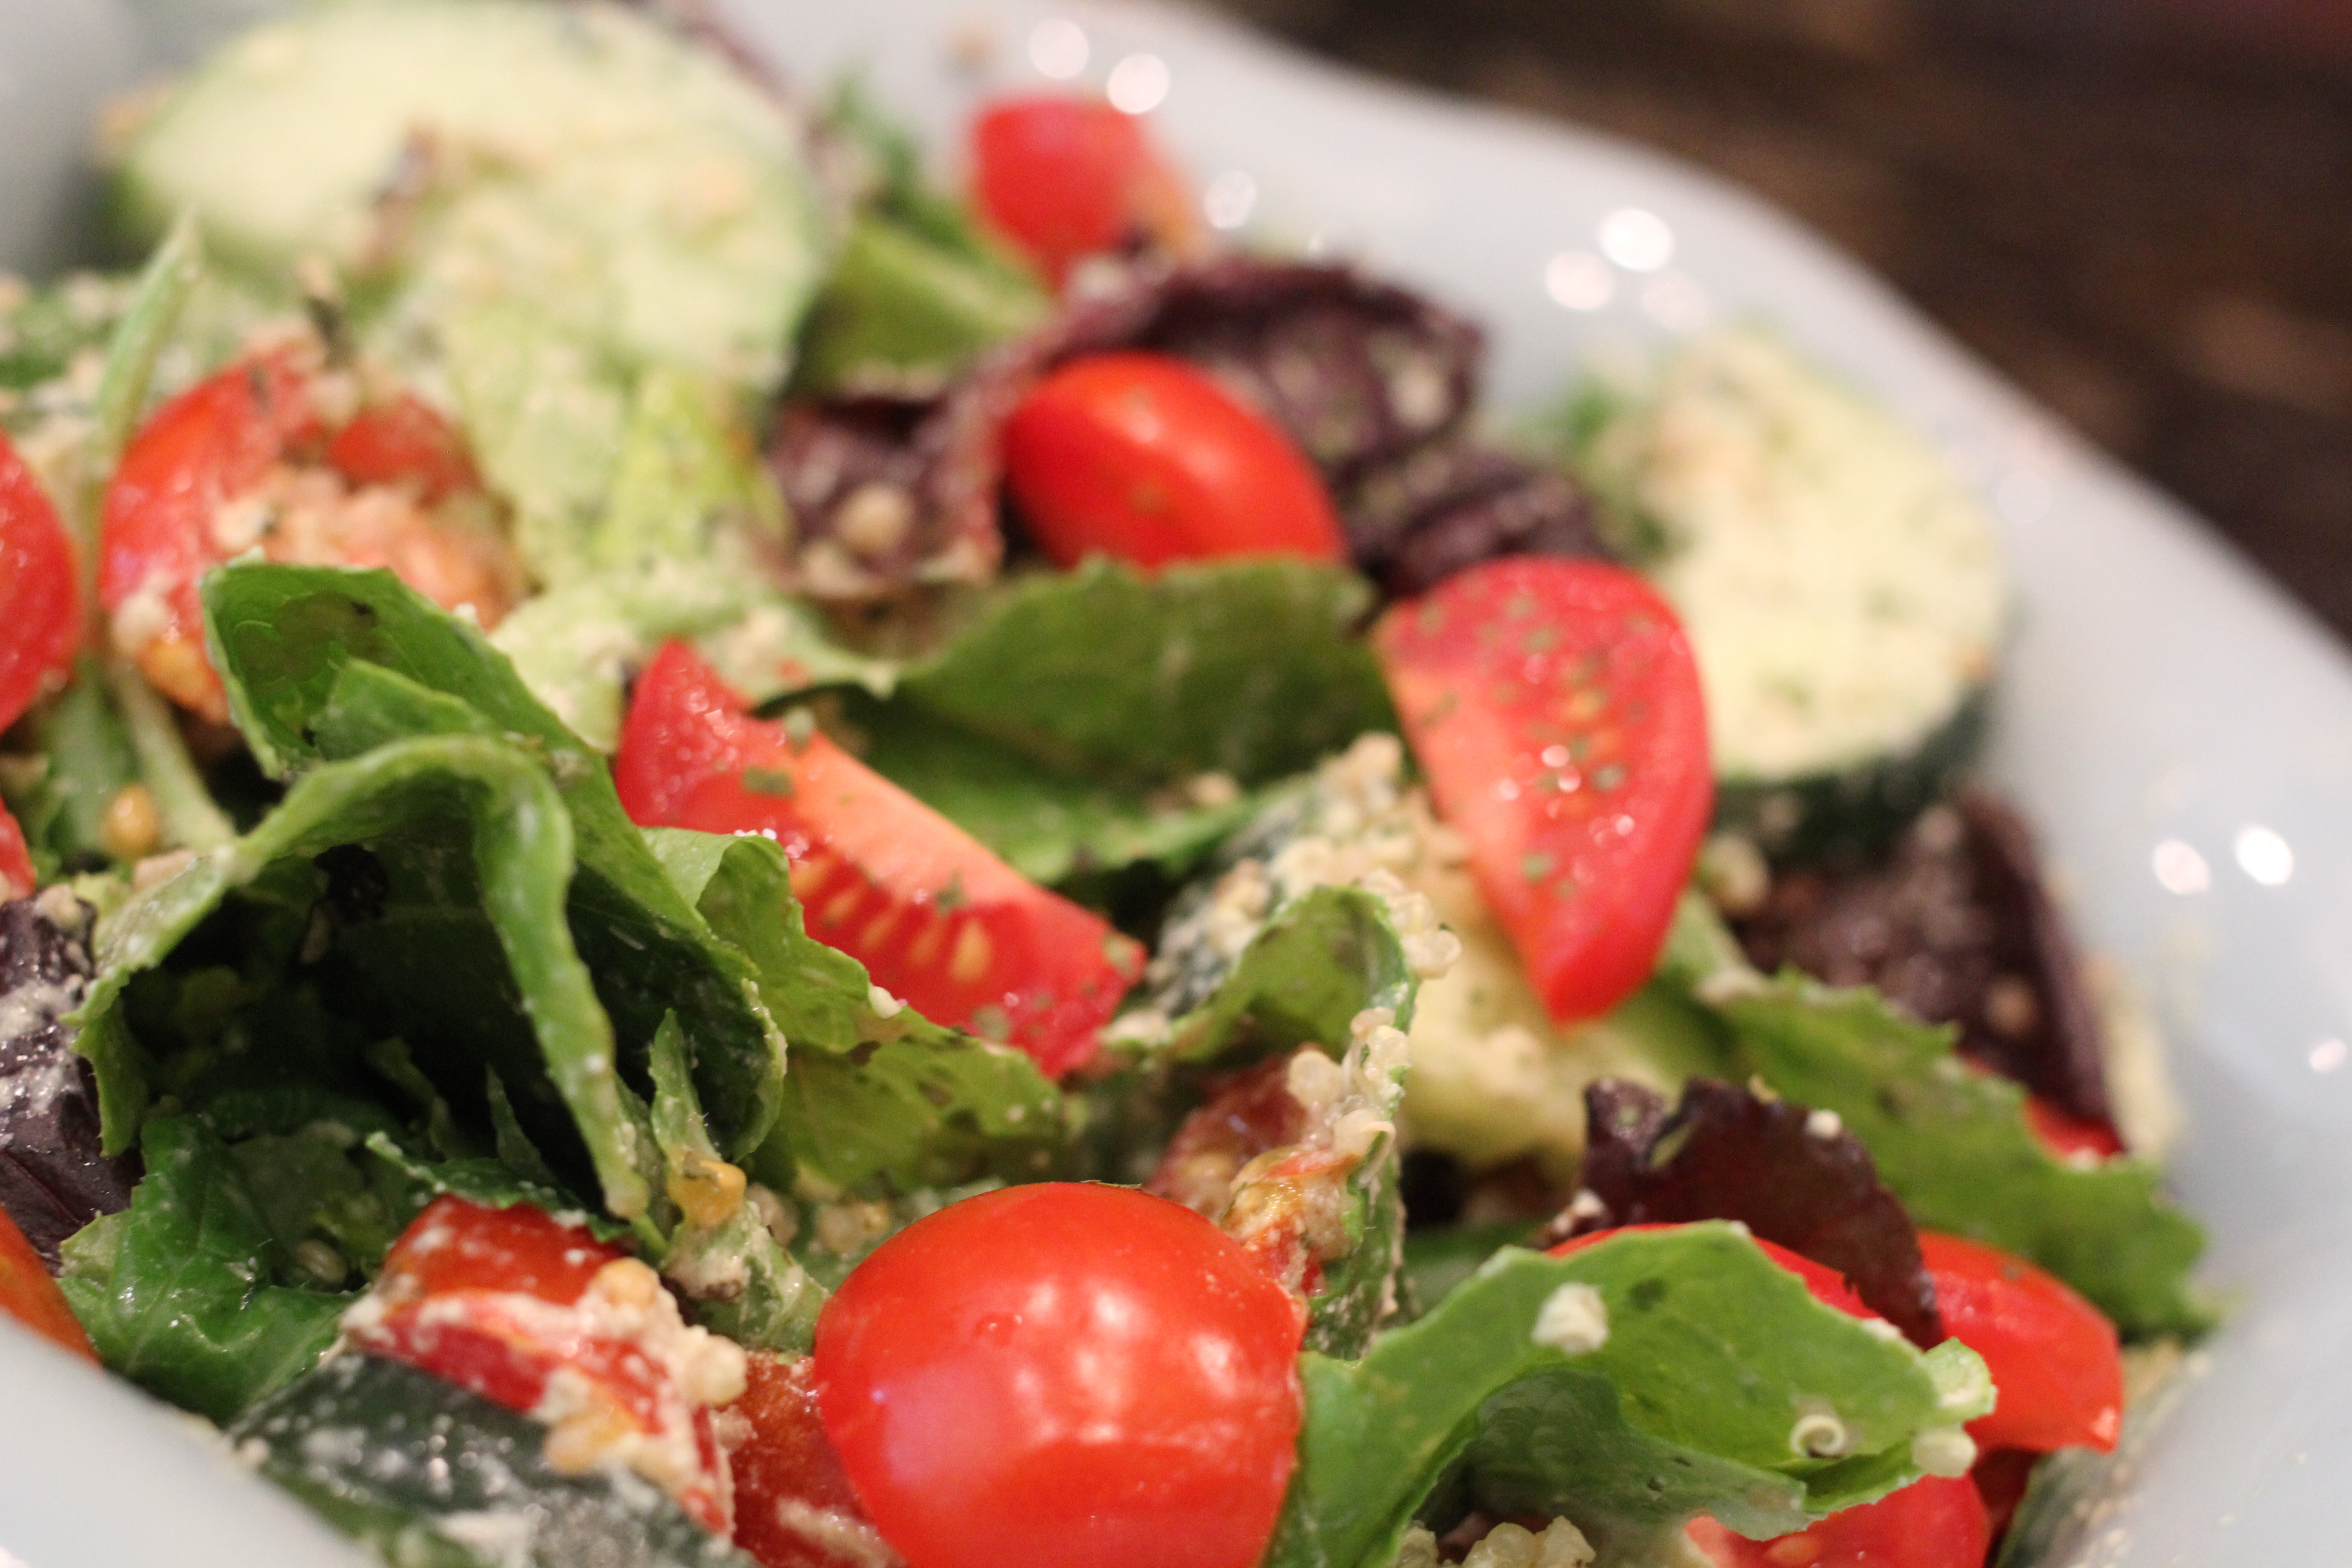 ... green salad quinoa taboulé salad quinoa tabbouleh with cherries